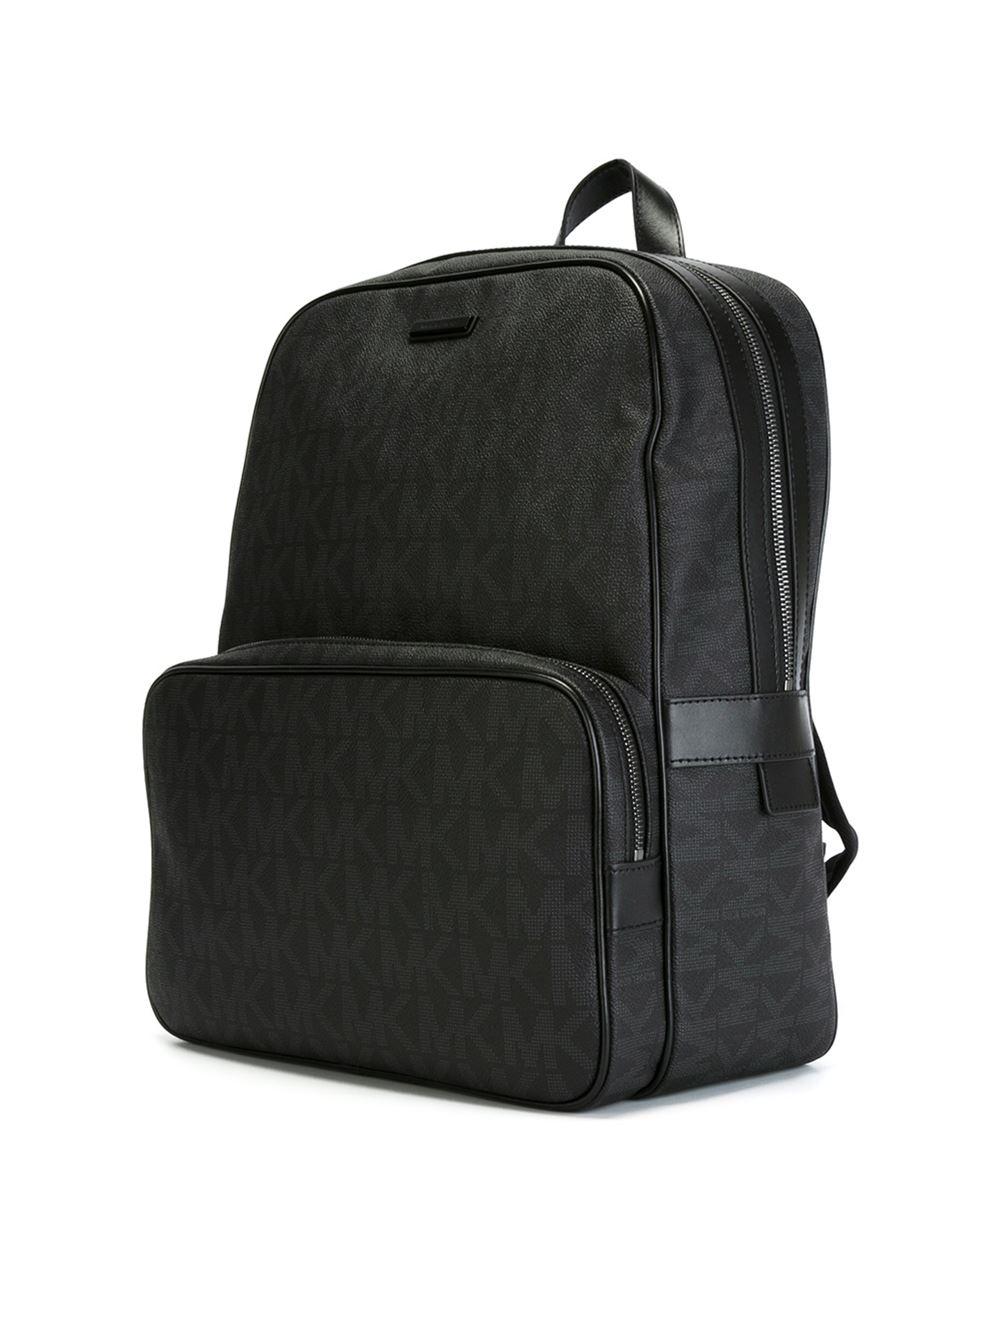 72d67d91abcf9d Michael Kors 'jet Set Logo' Backpack in Black for Men - Lyst